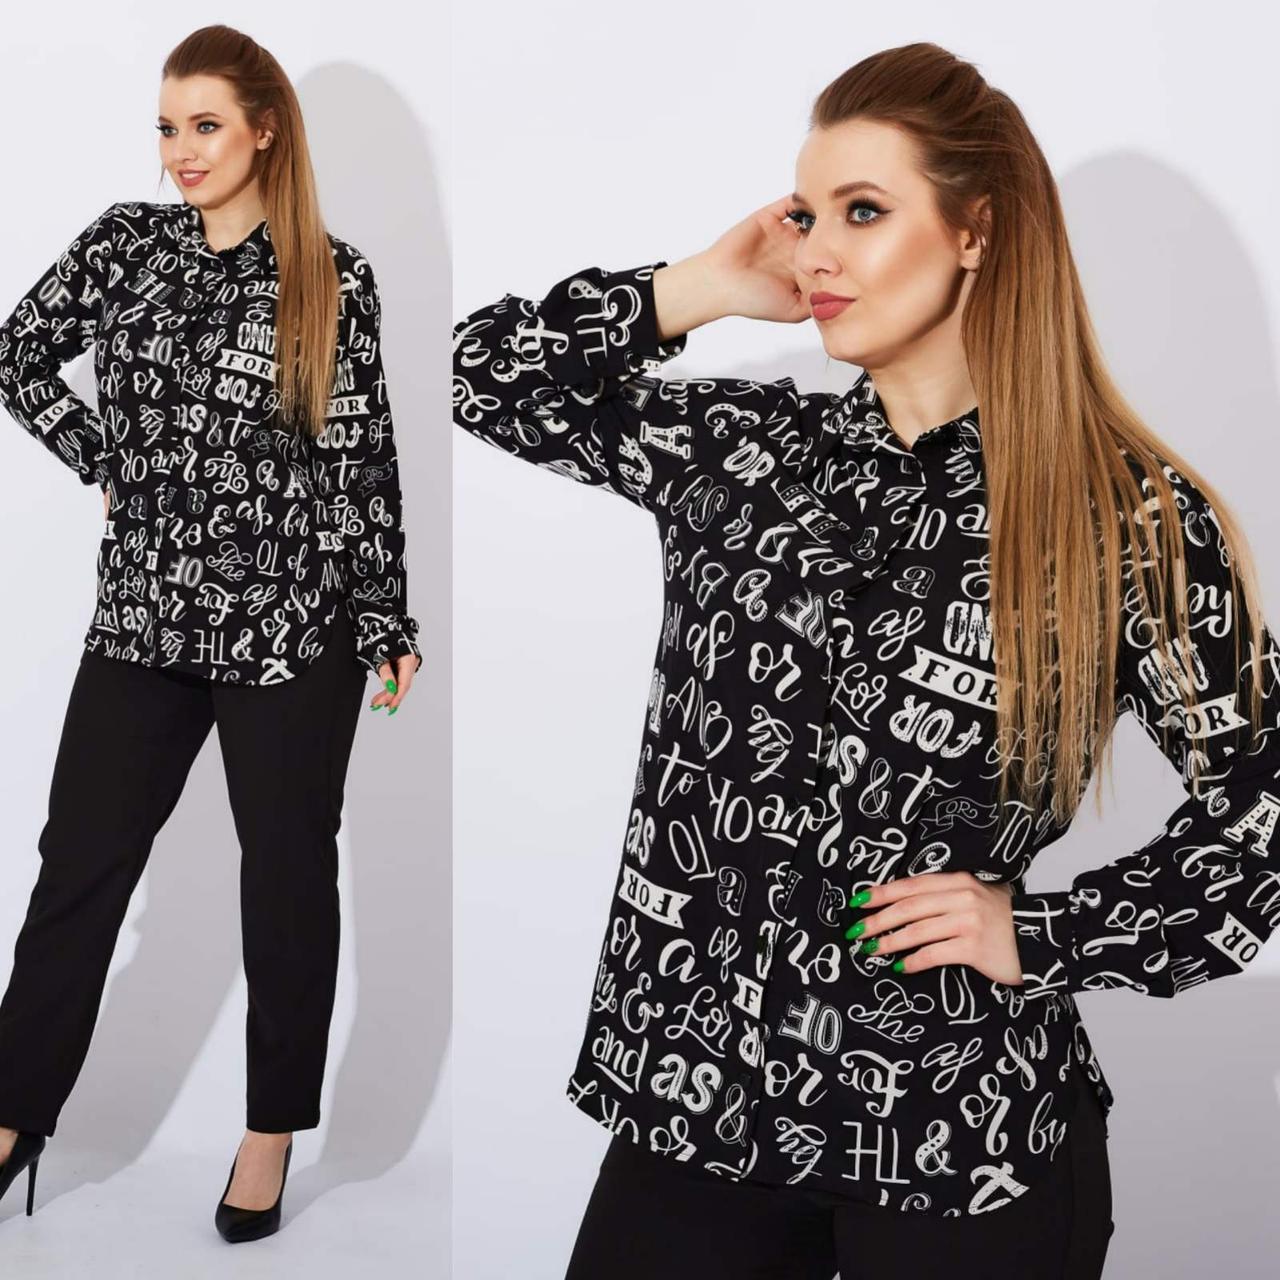 Жіноча батальна блуза-сорочка з написами (42-52)